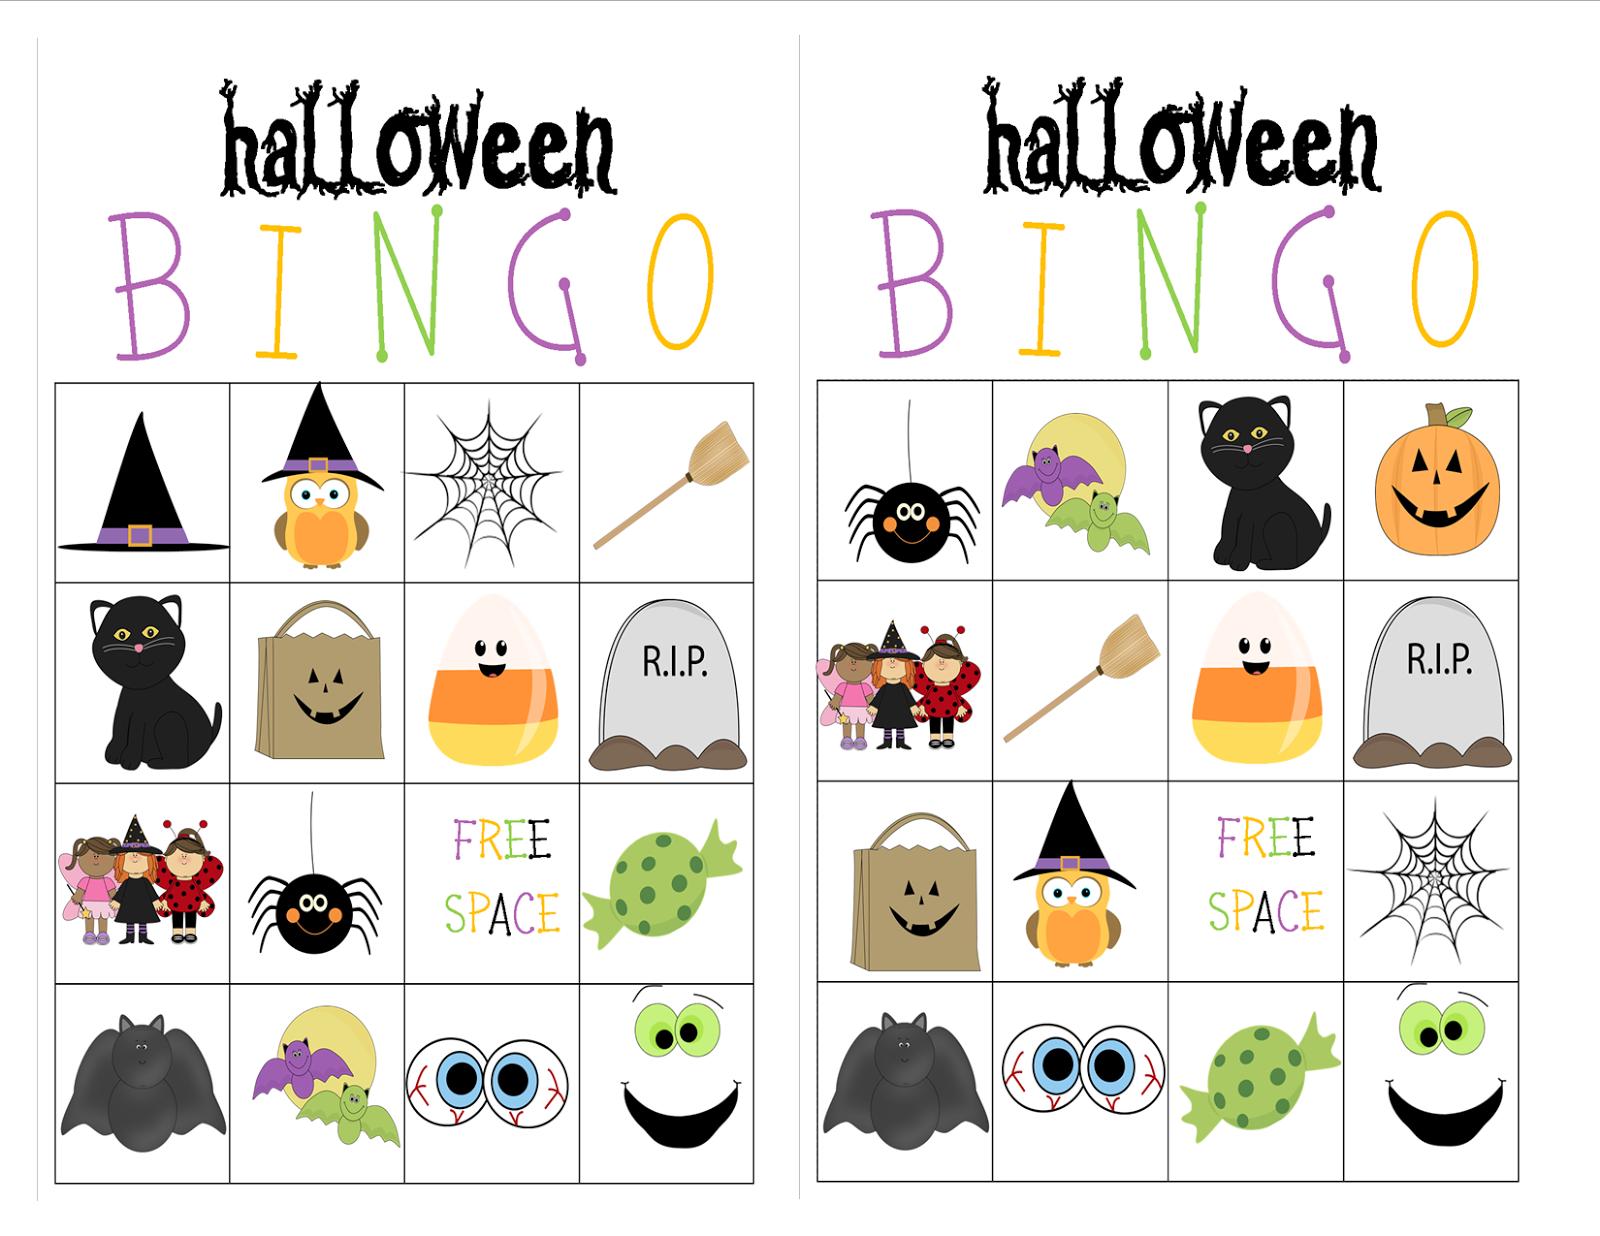 photo regarding Free Printable Halloween Bingo Cards referred to as 590 x 826 90 kb jpeg absolutely free printable halloween bingo playing cards